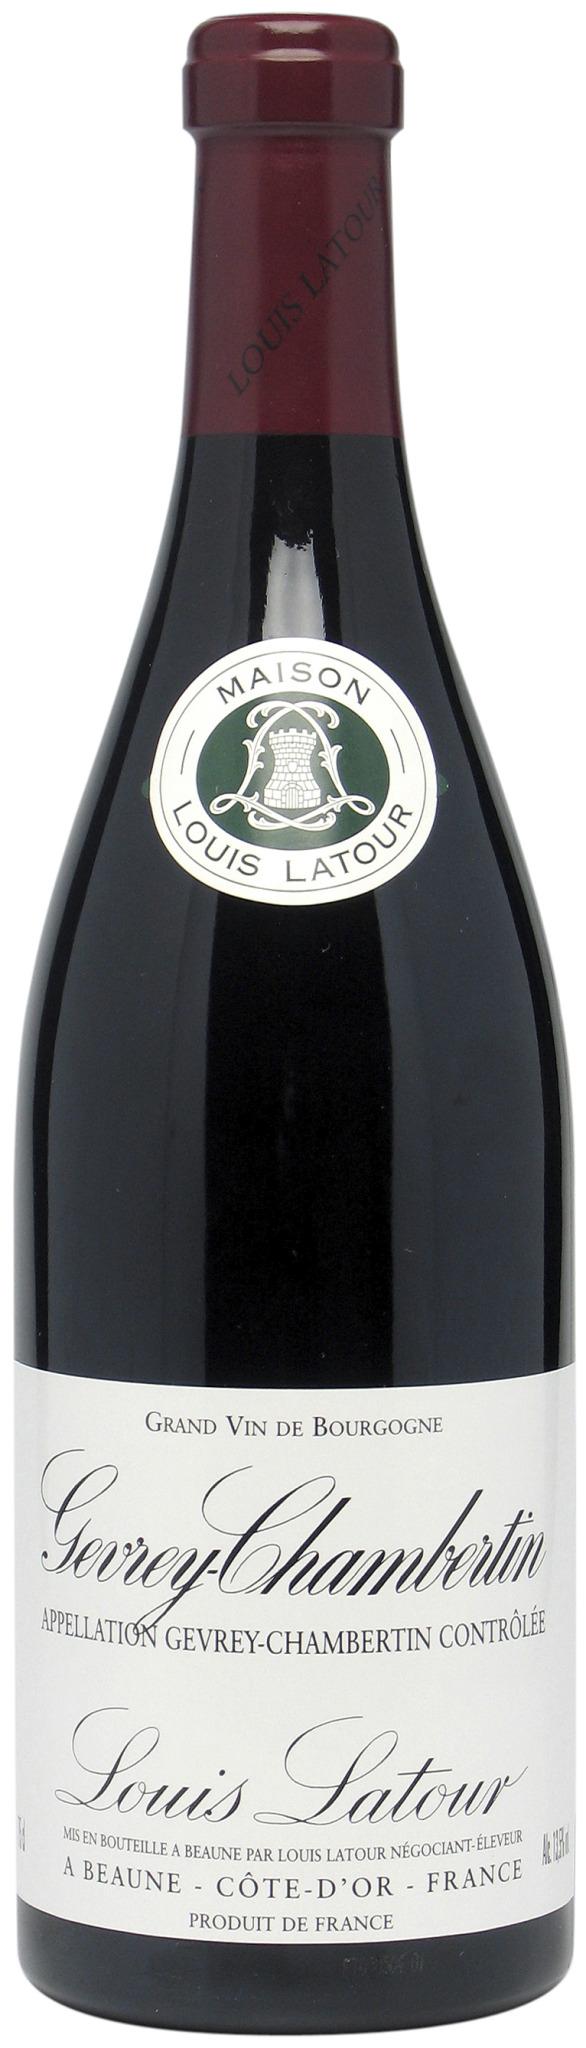 Gevrey Chambertin AC Louis Latour